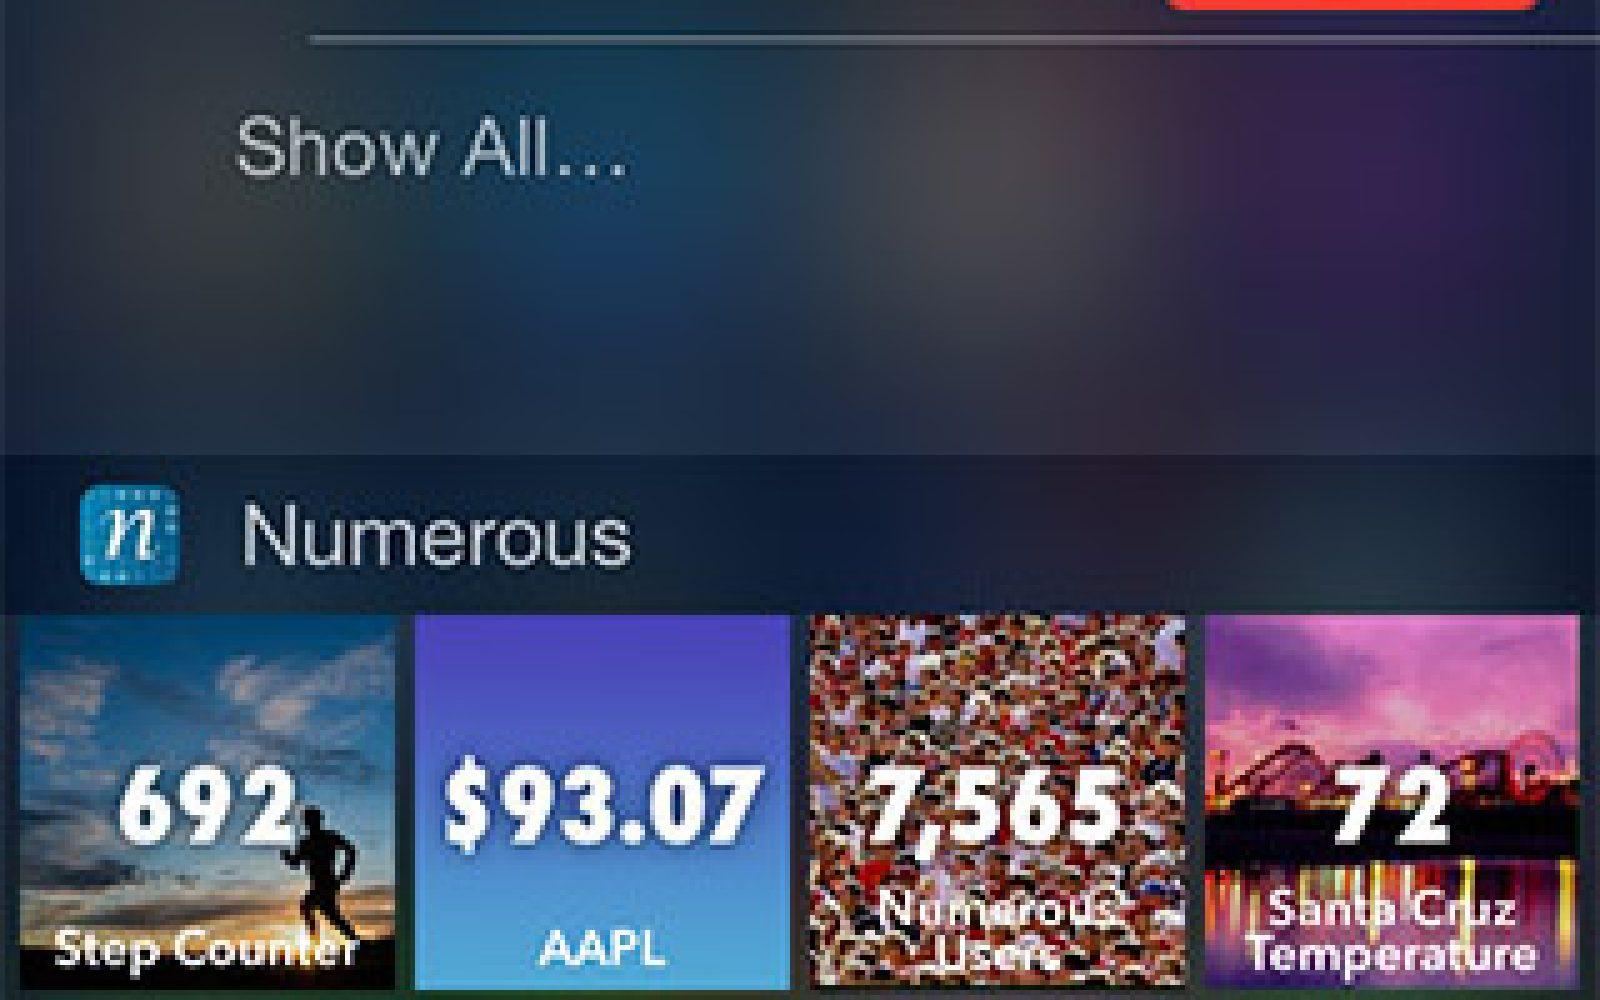 iPhone app Numerous previews iOS 8 Notification Center integration